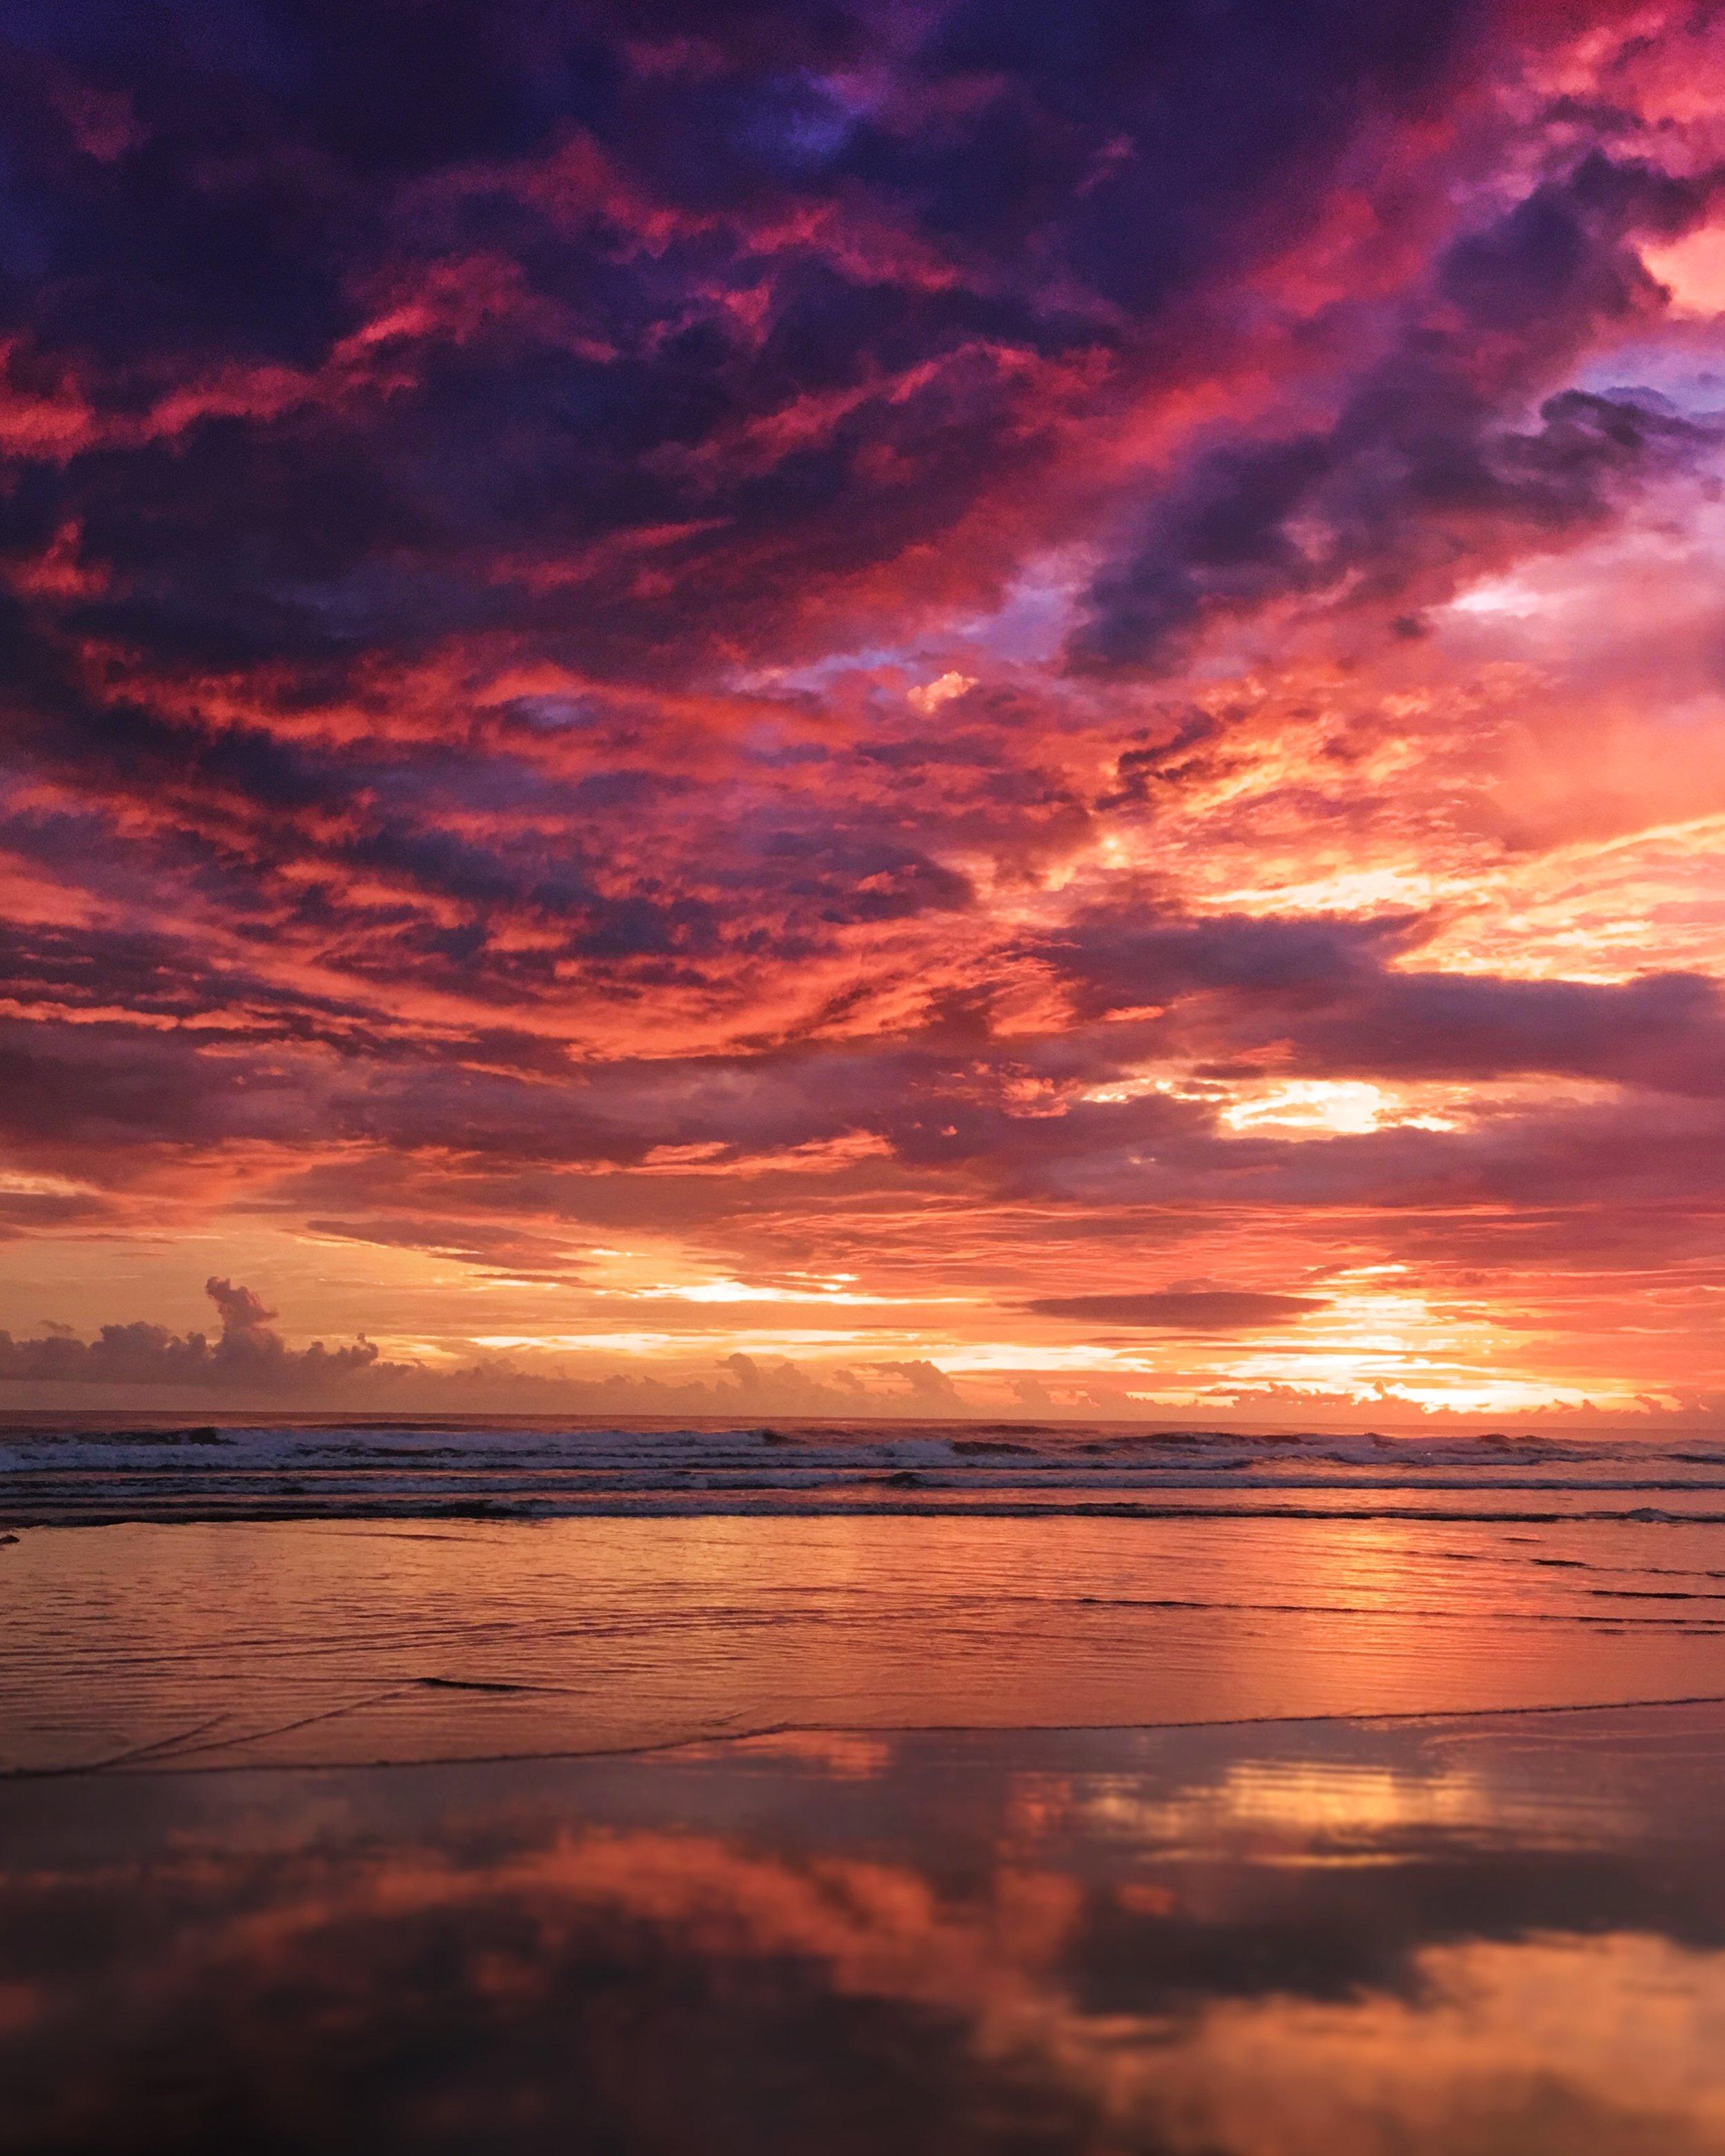 dominical-costa-rica-wander-south-sunset-1.jpg